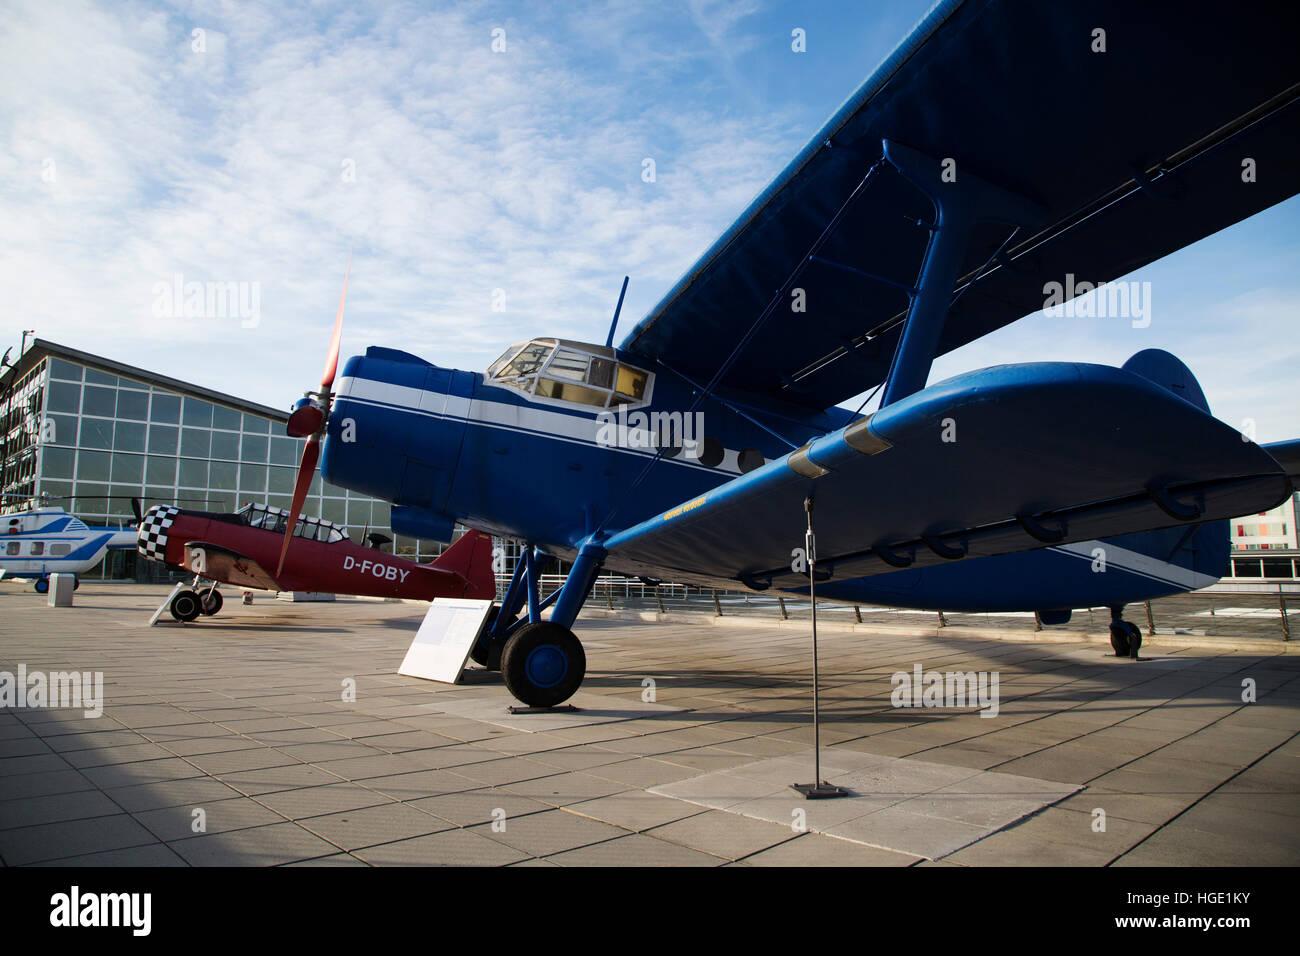 An Antonow AN-2 biplane at Stuttgart Airport in Stuttgart, Germany. - Stock Image